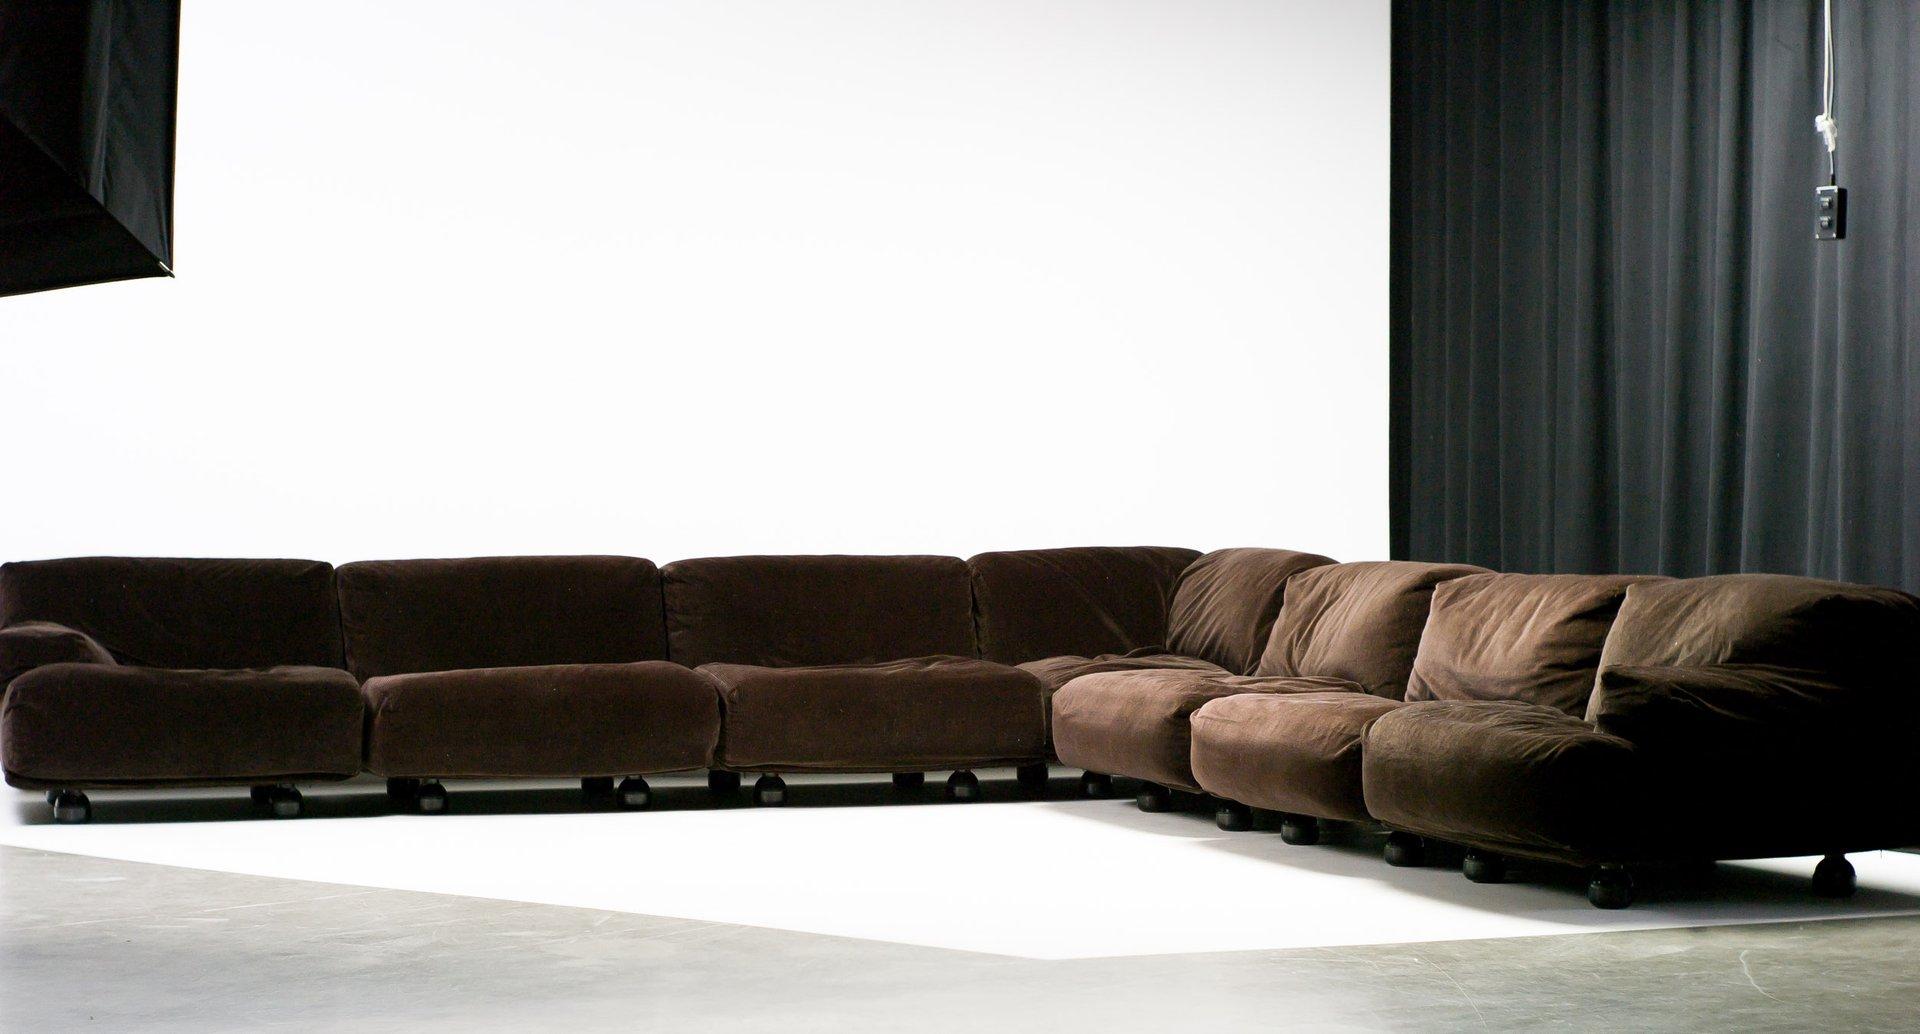 large modular fiandra sofa by vico magistretti for cassina. Black Bedroom Furniture Sets. Home Design Ideas